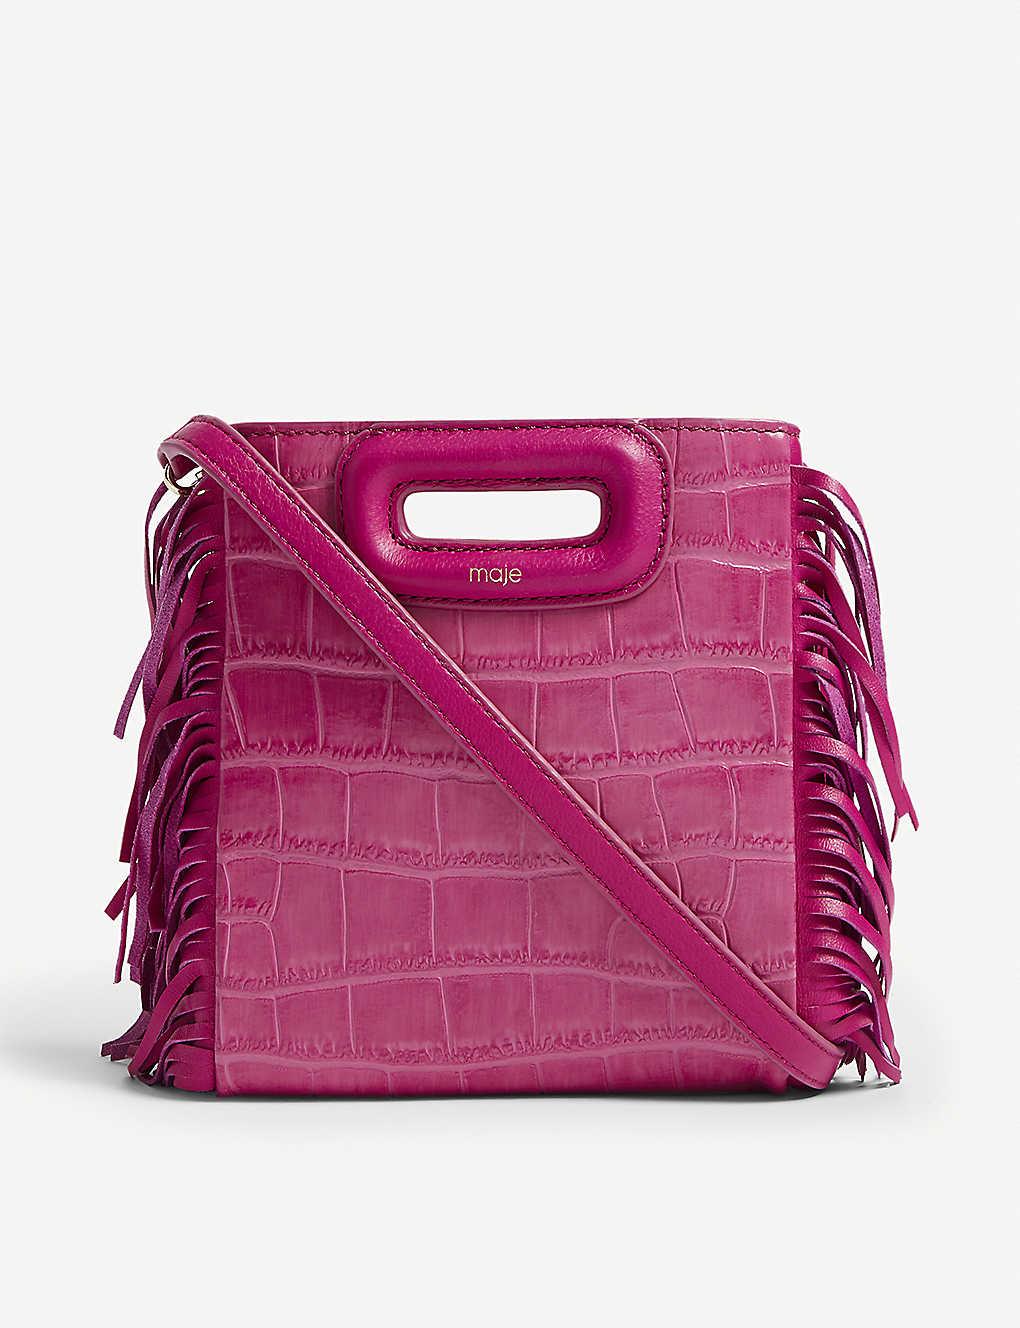 41a26c789da9 MAJE - Mini M shoulder bag